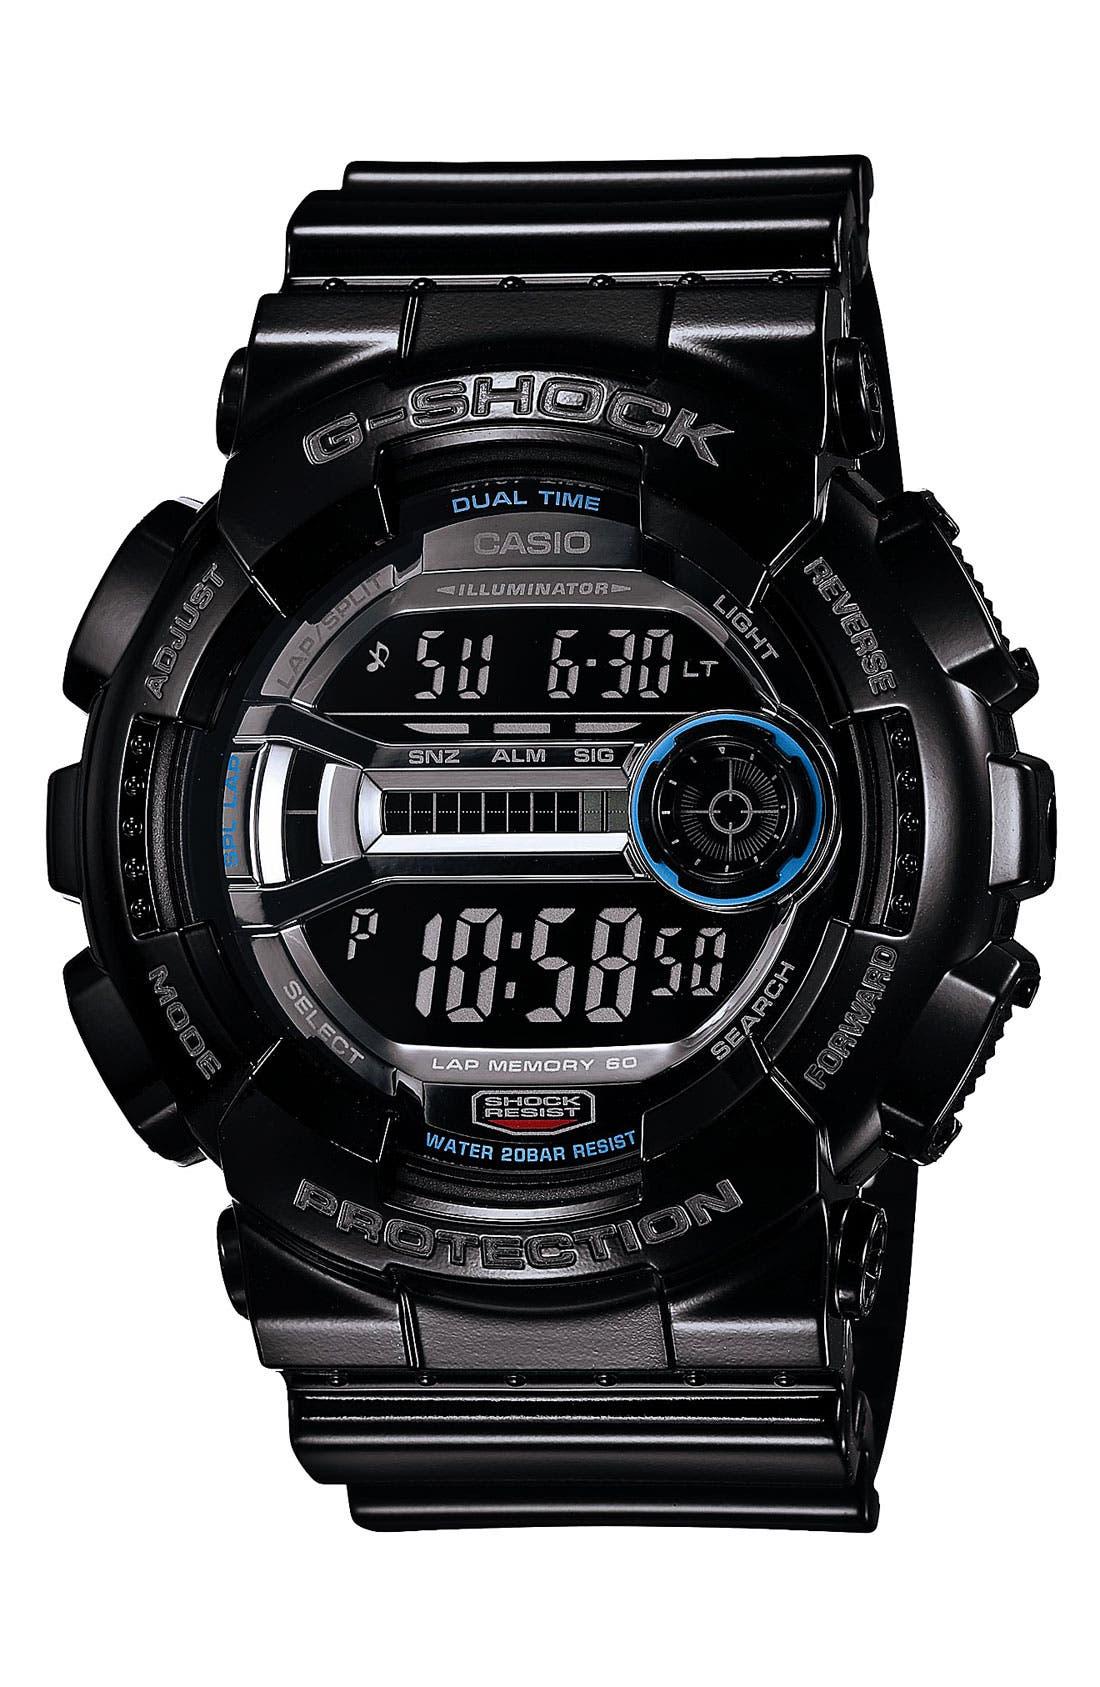 Main Image - G-Shock 'X-Large' Digital Watch, 55mm x 51mm